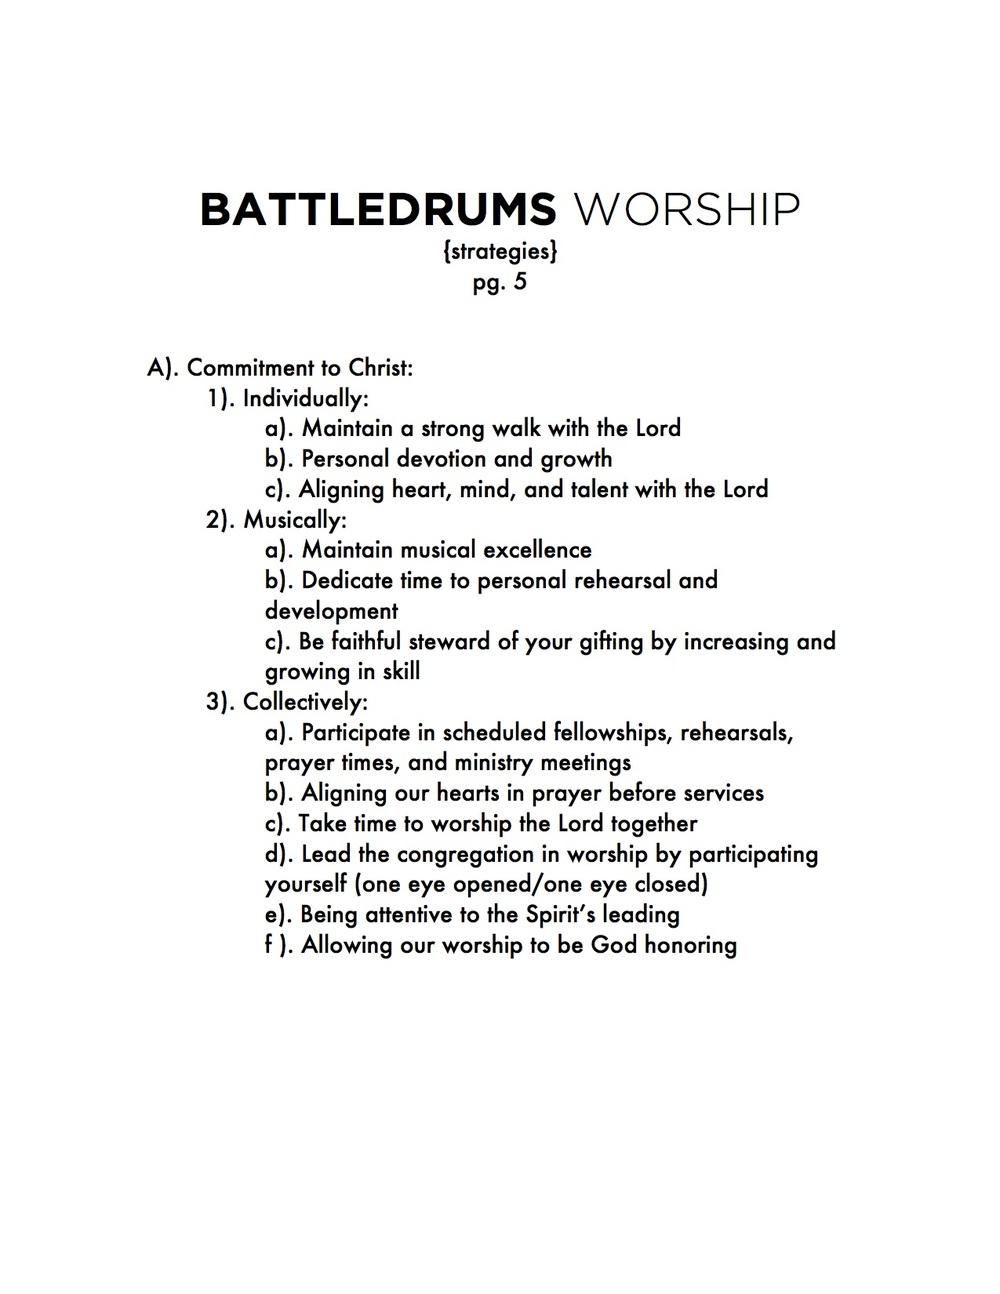 battledrumsHBWeb-pg5.jpg